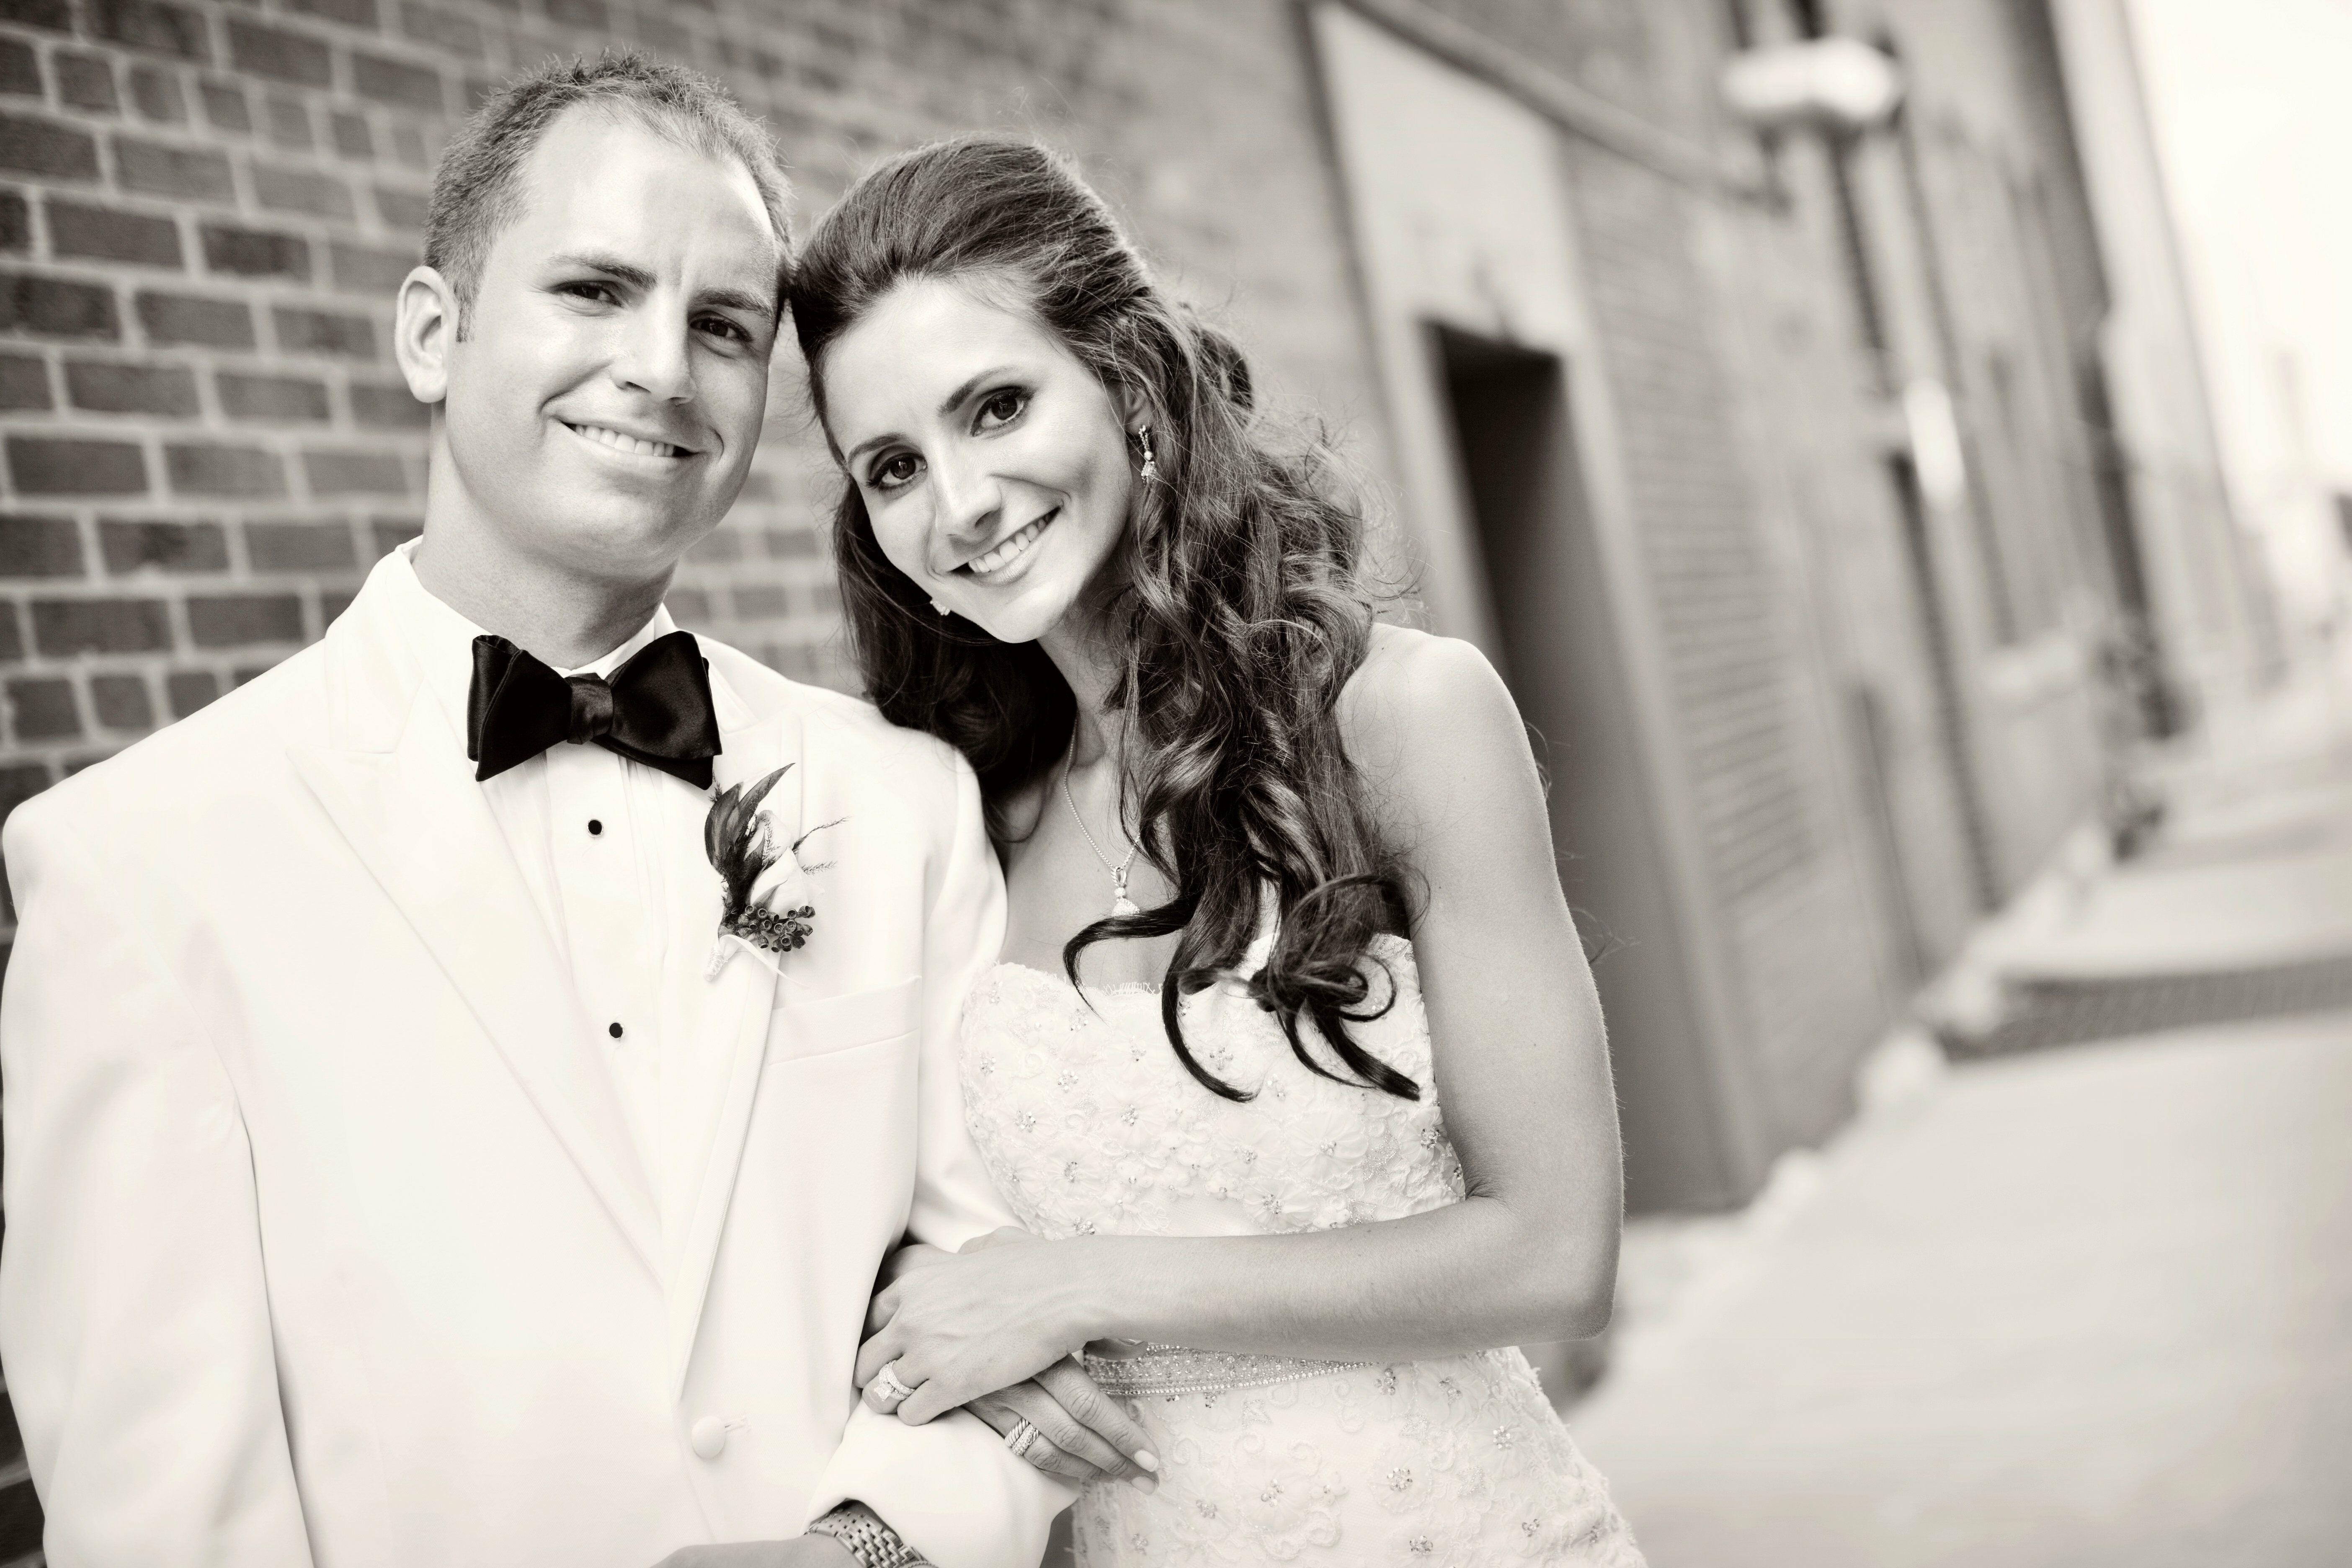 Used bridesmaid dresses columbus oh wedding dresses asian for Used wedding dresses columbus ohio